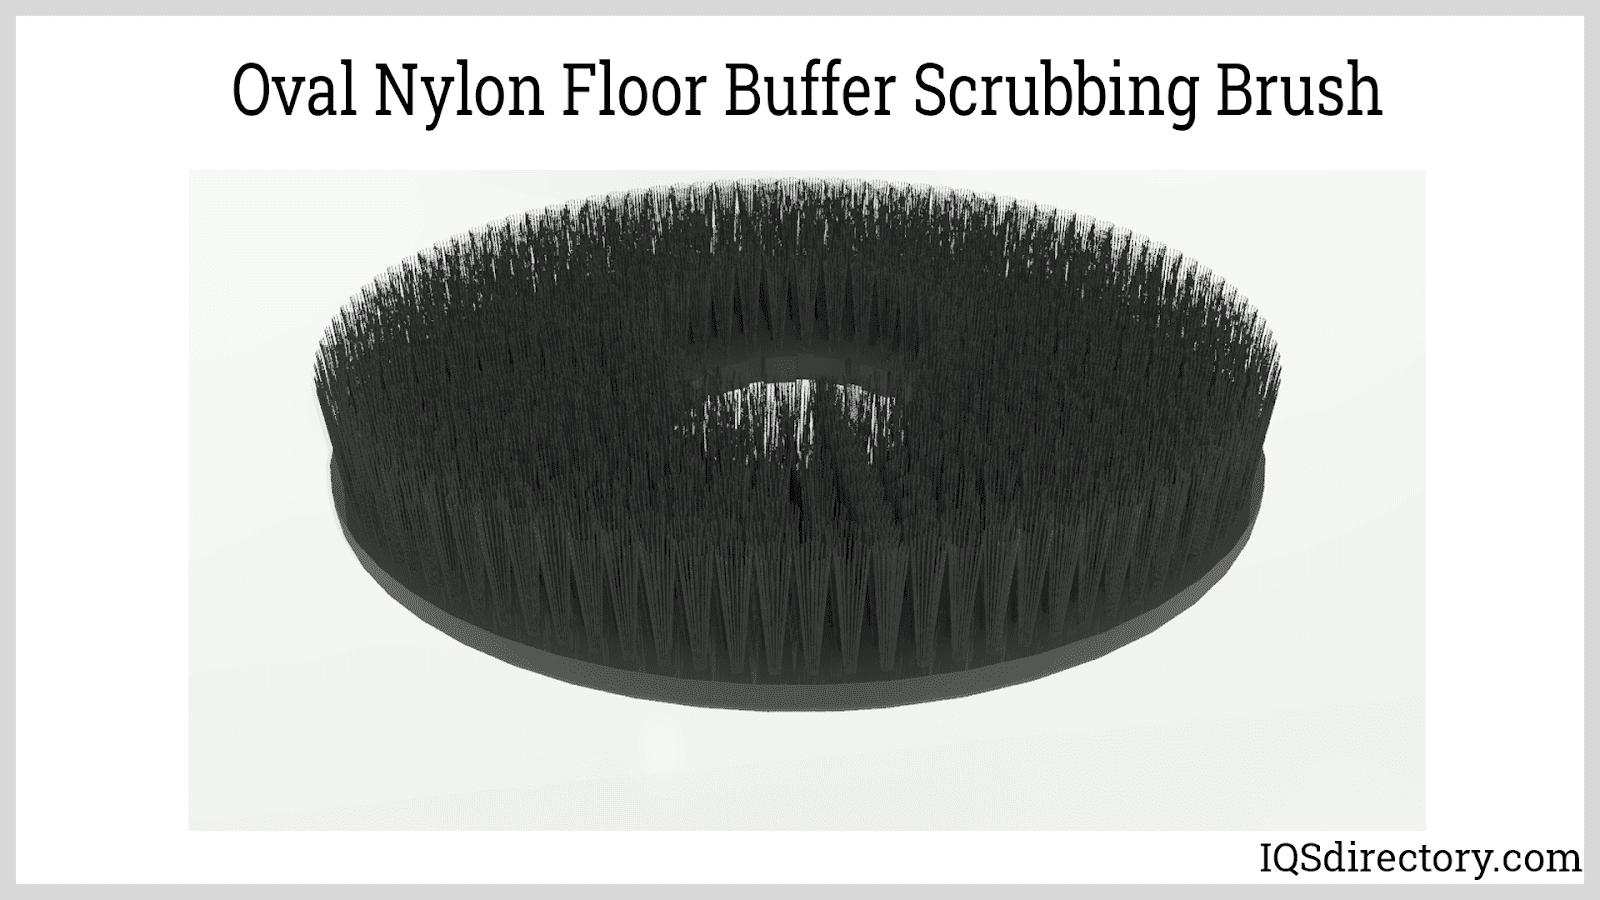 Oval Nylon Floor Buffer Scrubbing Brush